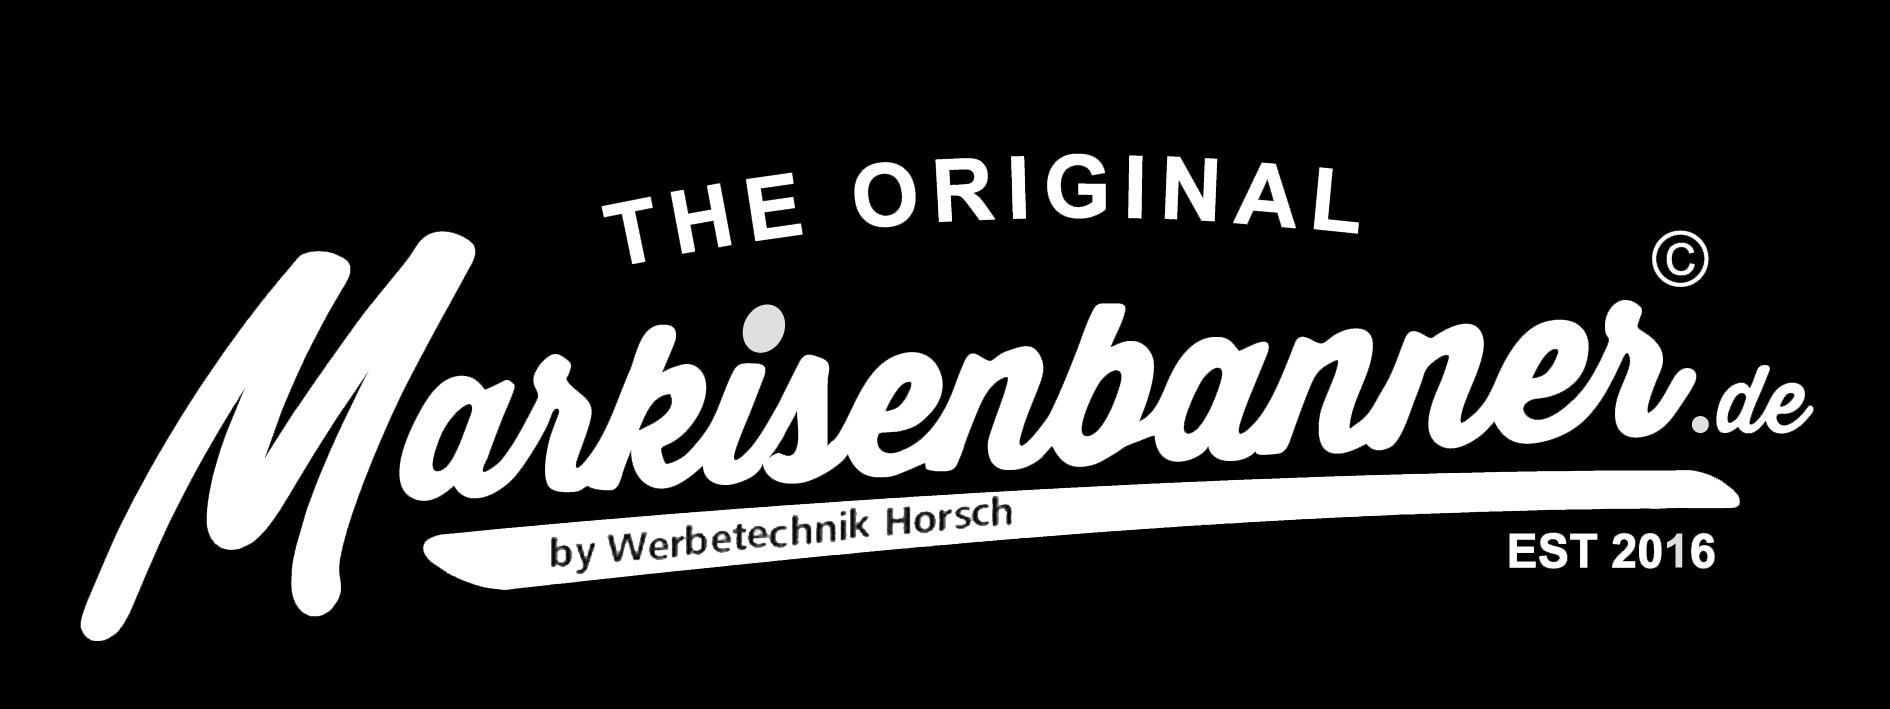 MARKISENBANNER.de by Werbetechnik Horsch